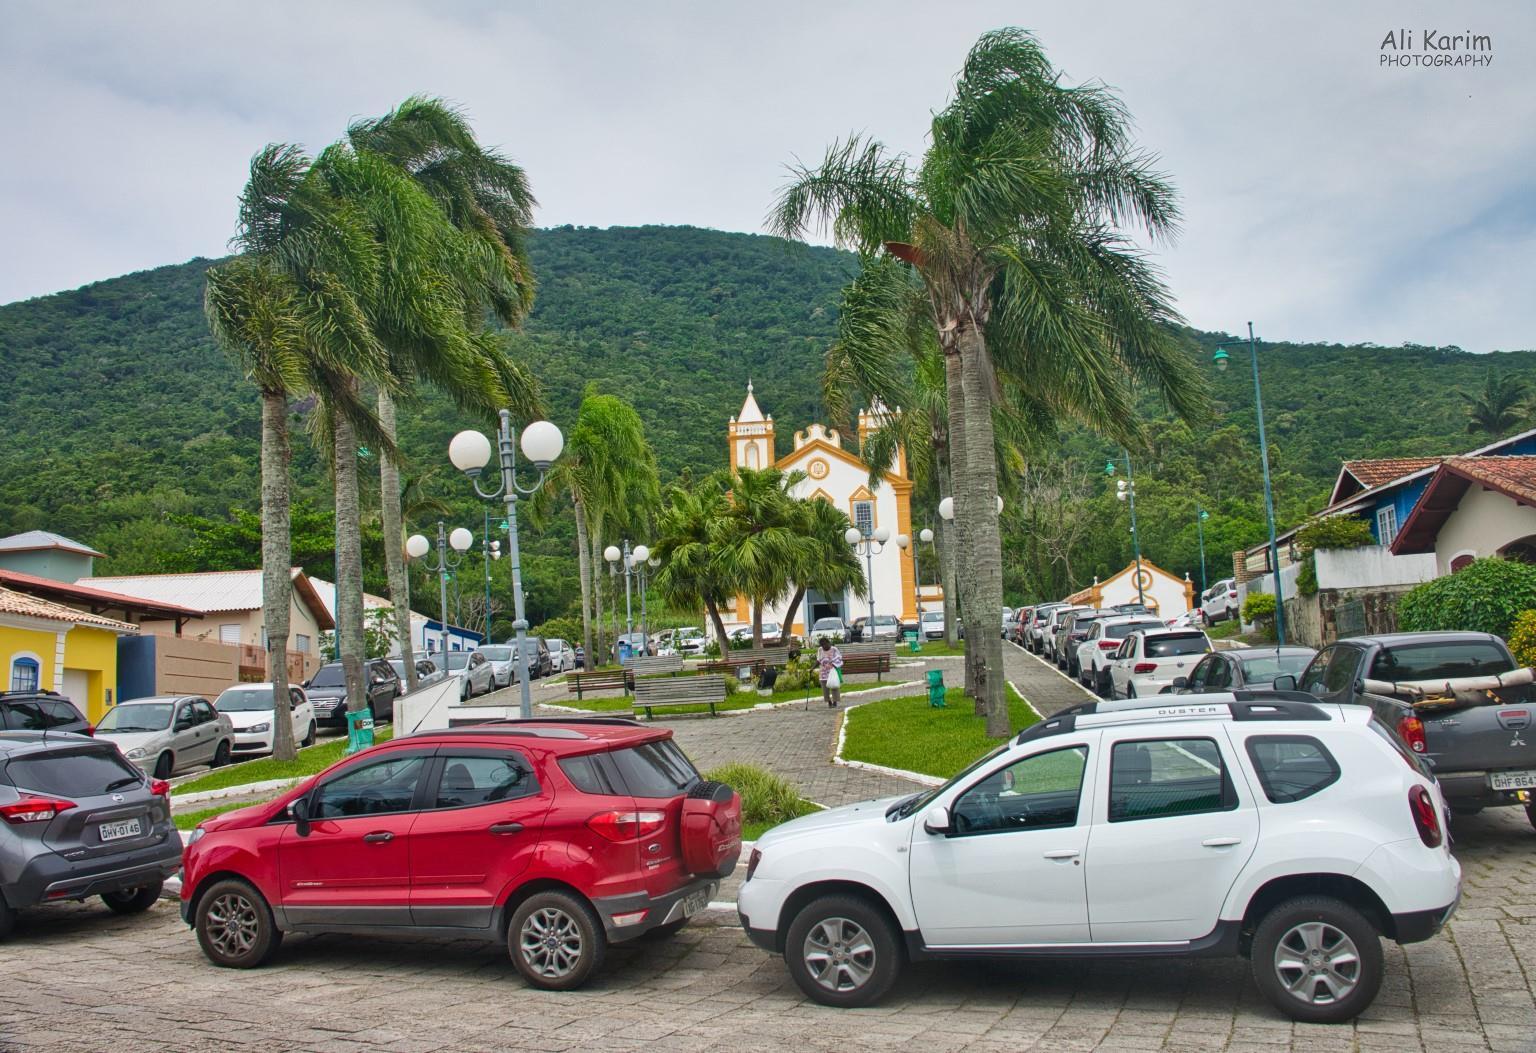 Florianópolis, Brazil Santo Antonio de Lisboa was an old, well preserved, colonial Portuguese town